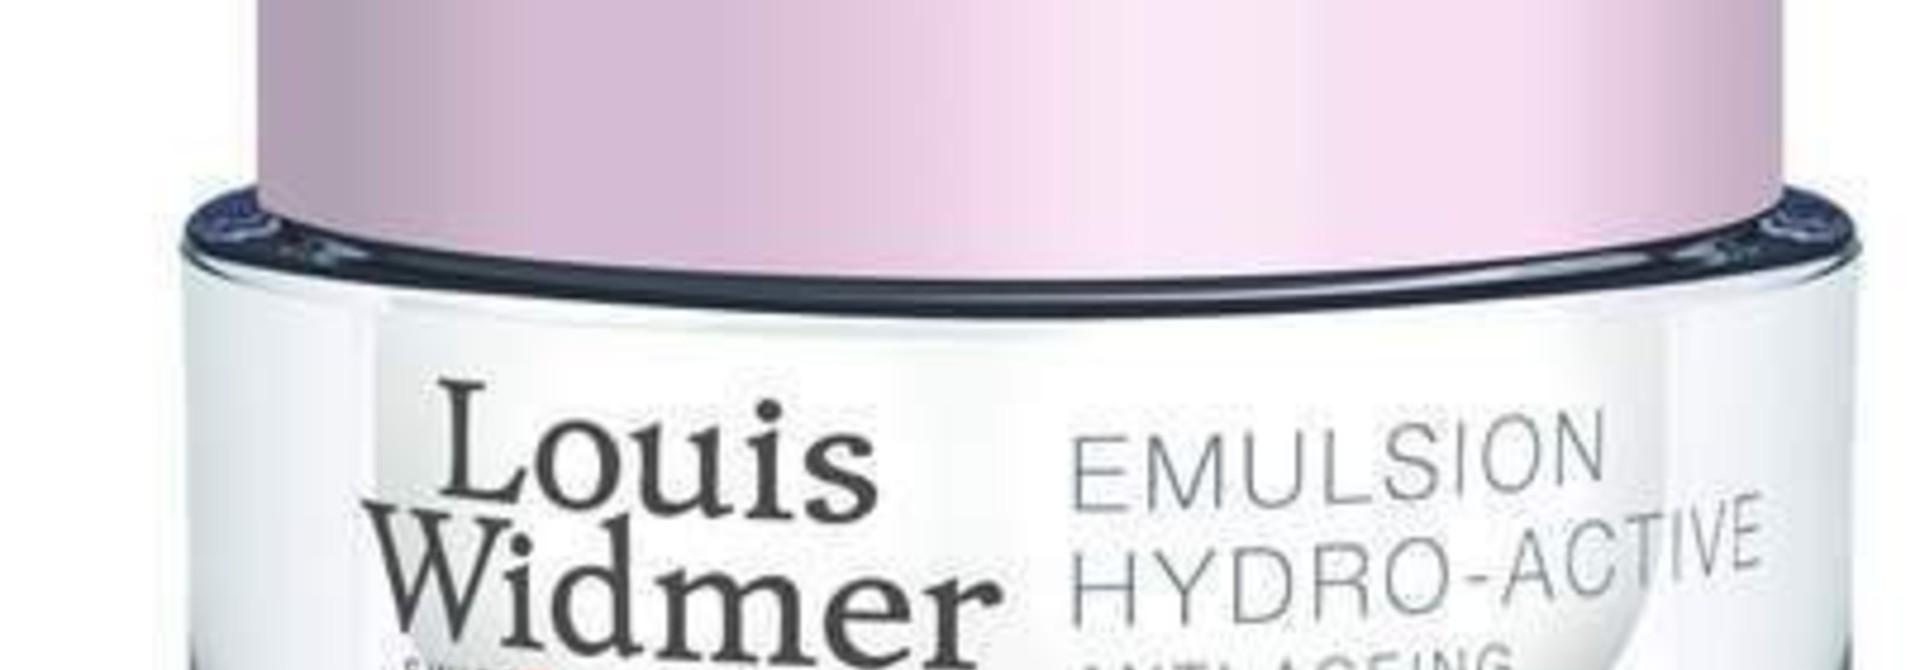 Emulsion Hydro-Active 50 ml licht geparfumeerd